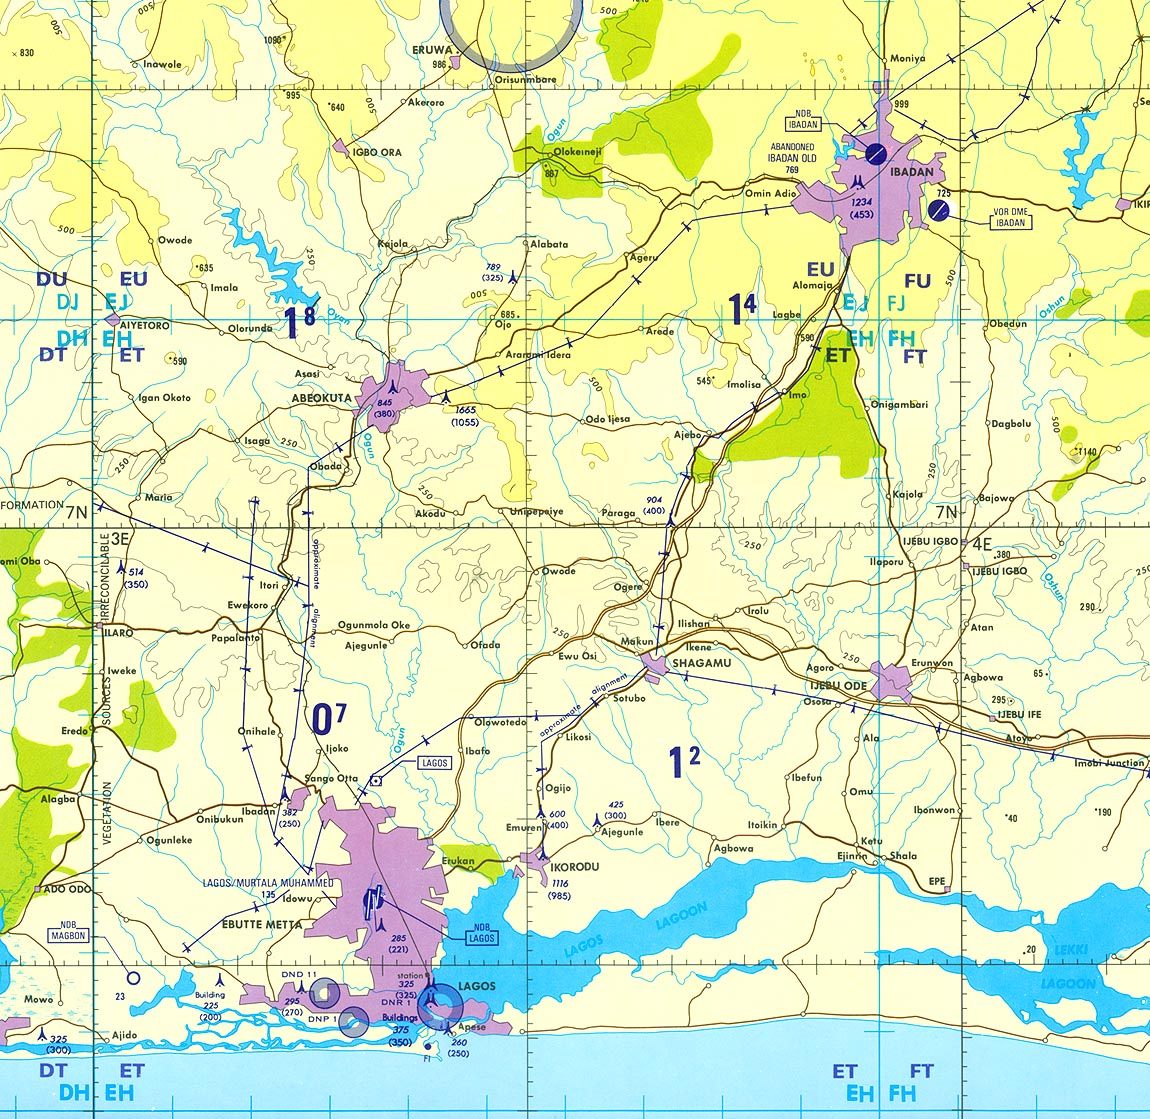 Download free nigeria maps gumiabroncs Gallery